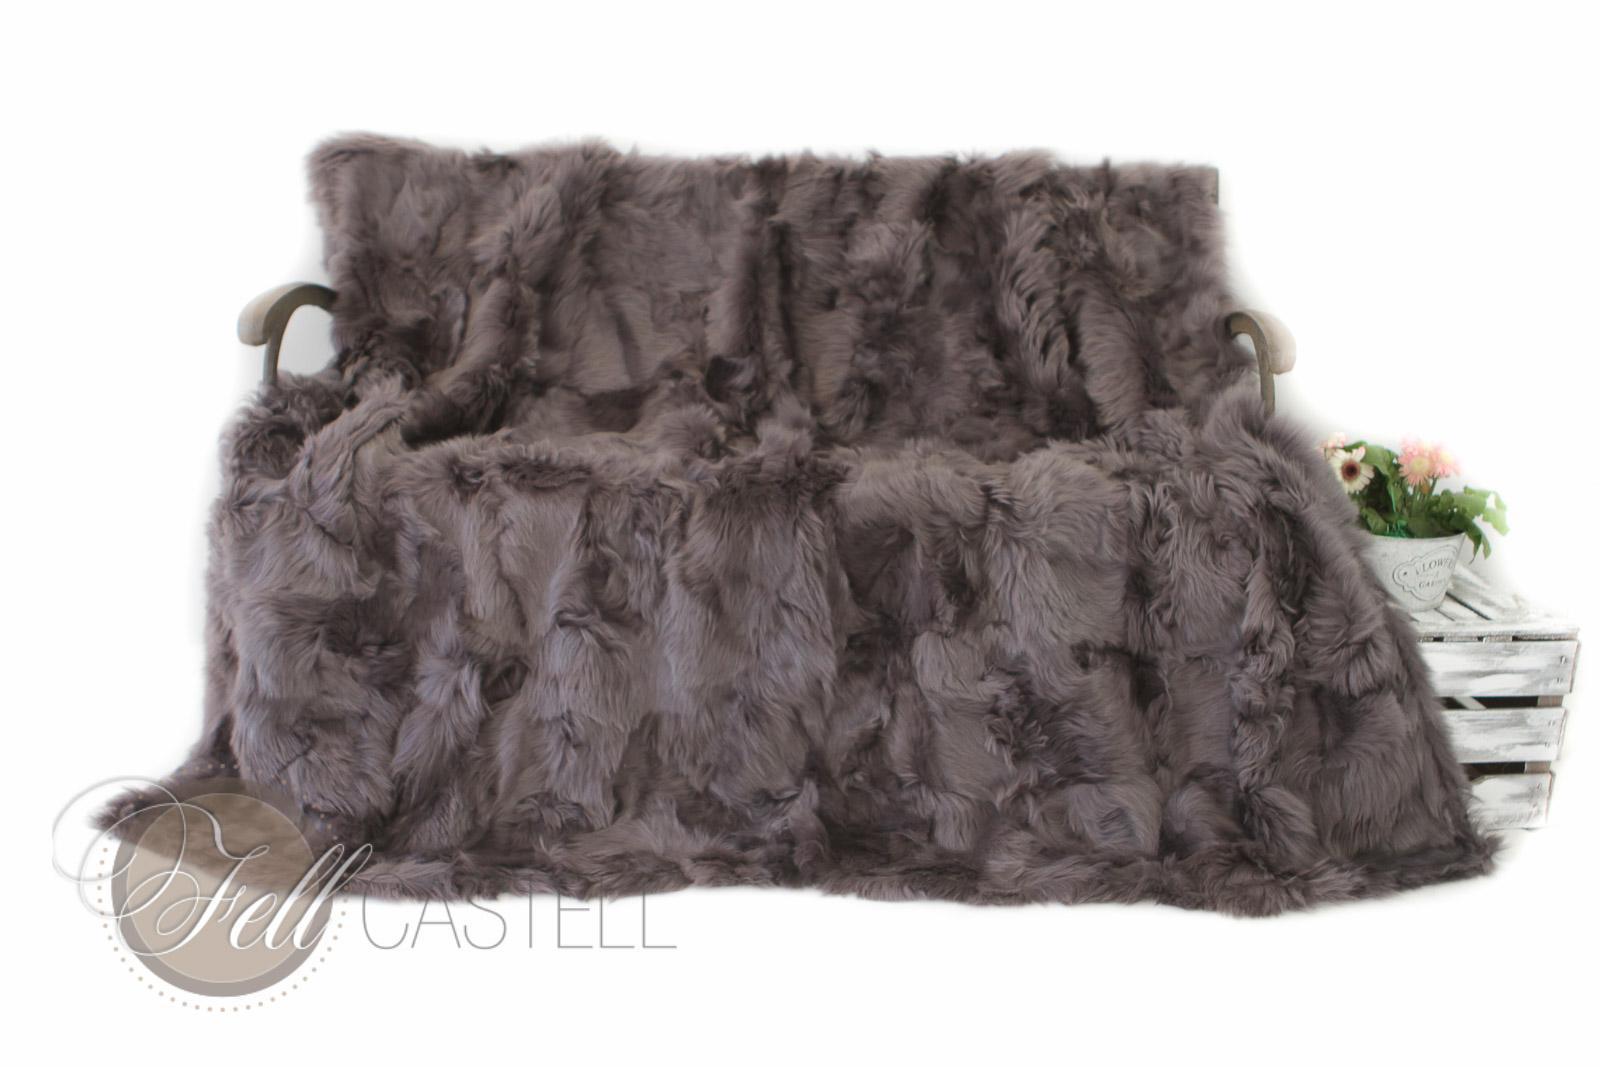 lammfell decke 200x155 cm grau lila patchwork toscana lammfelldecke r ckseite leder lammfell. Black Bedroom Furniture Sets. Home Design Ideas